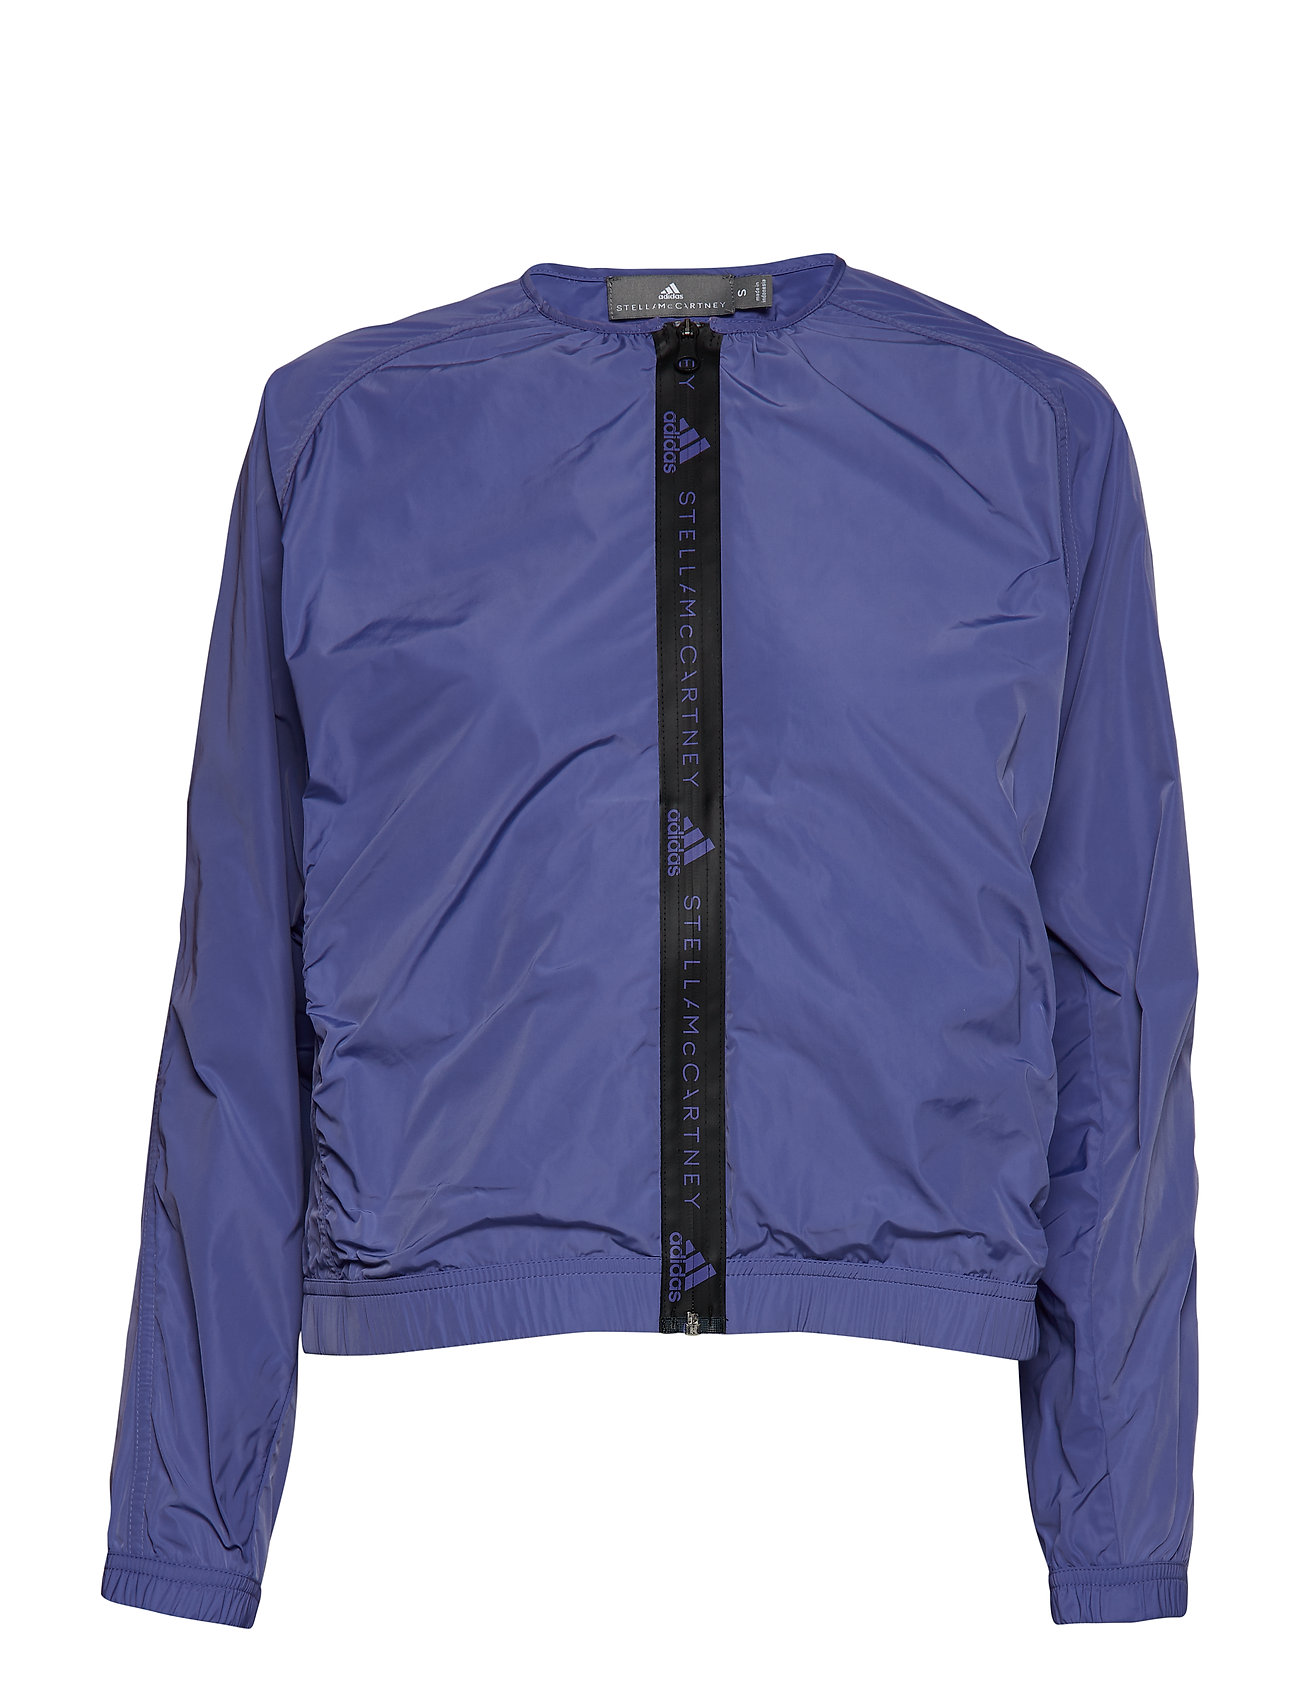 Adidas by Stella McCartney BOMBER JKT Ytterkläder